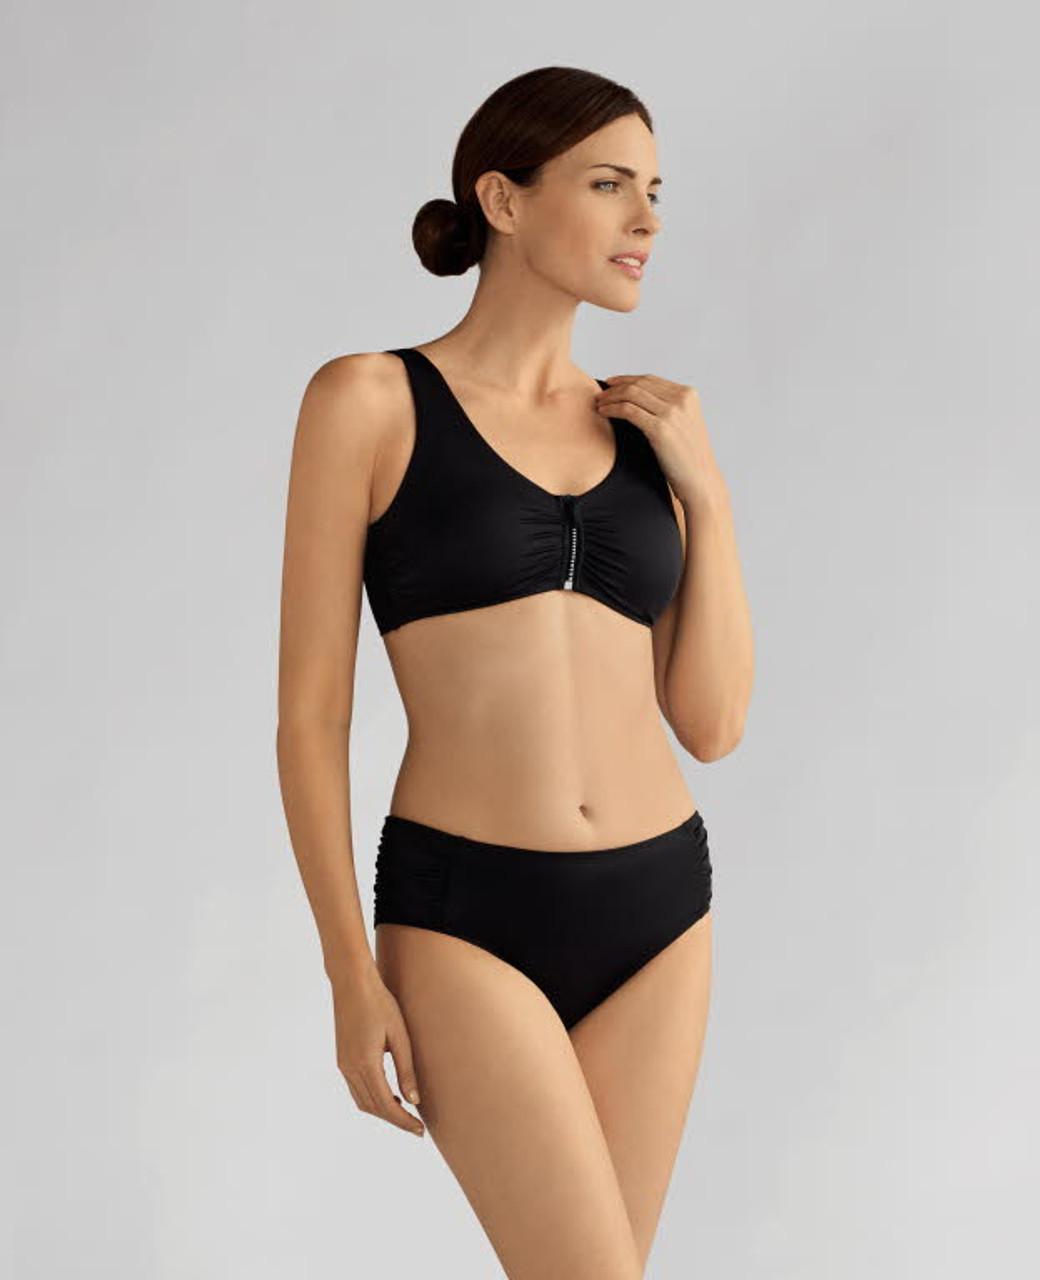 db690c0f0fa Amoena 71123 Cocos Mastectomy Swim Top - MastectomyShop.com